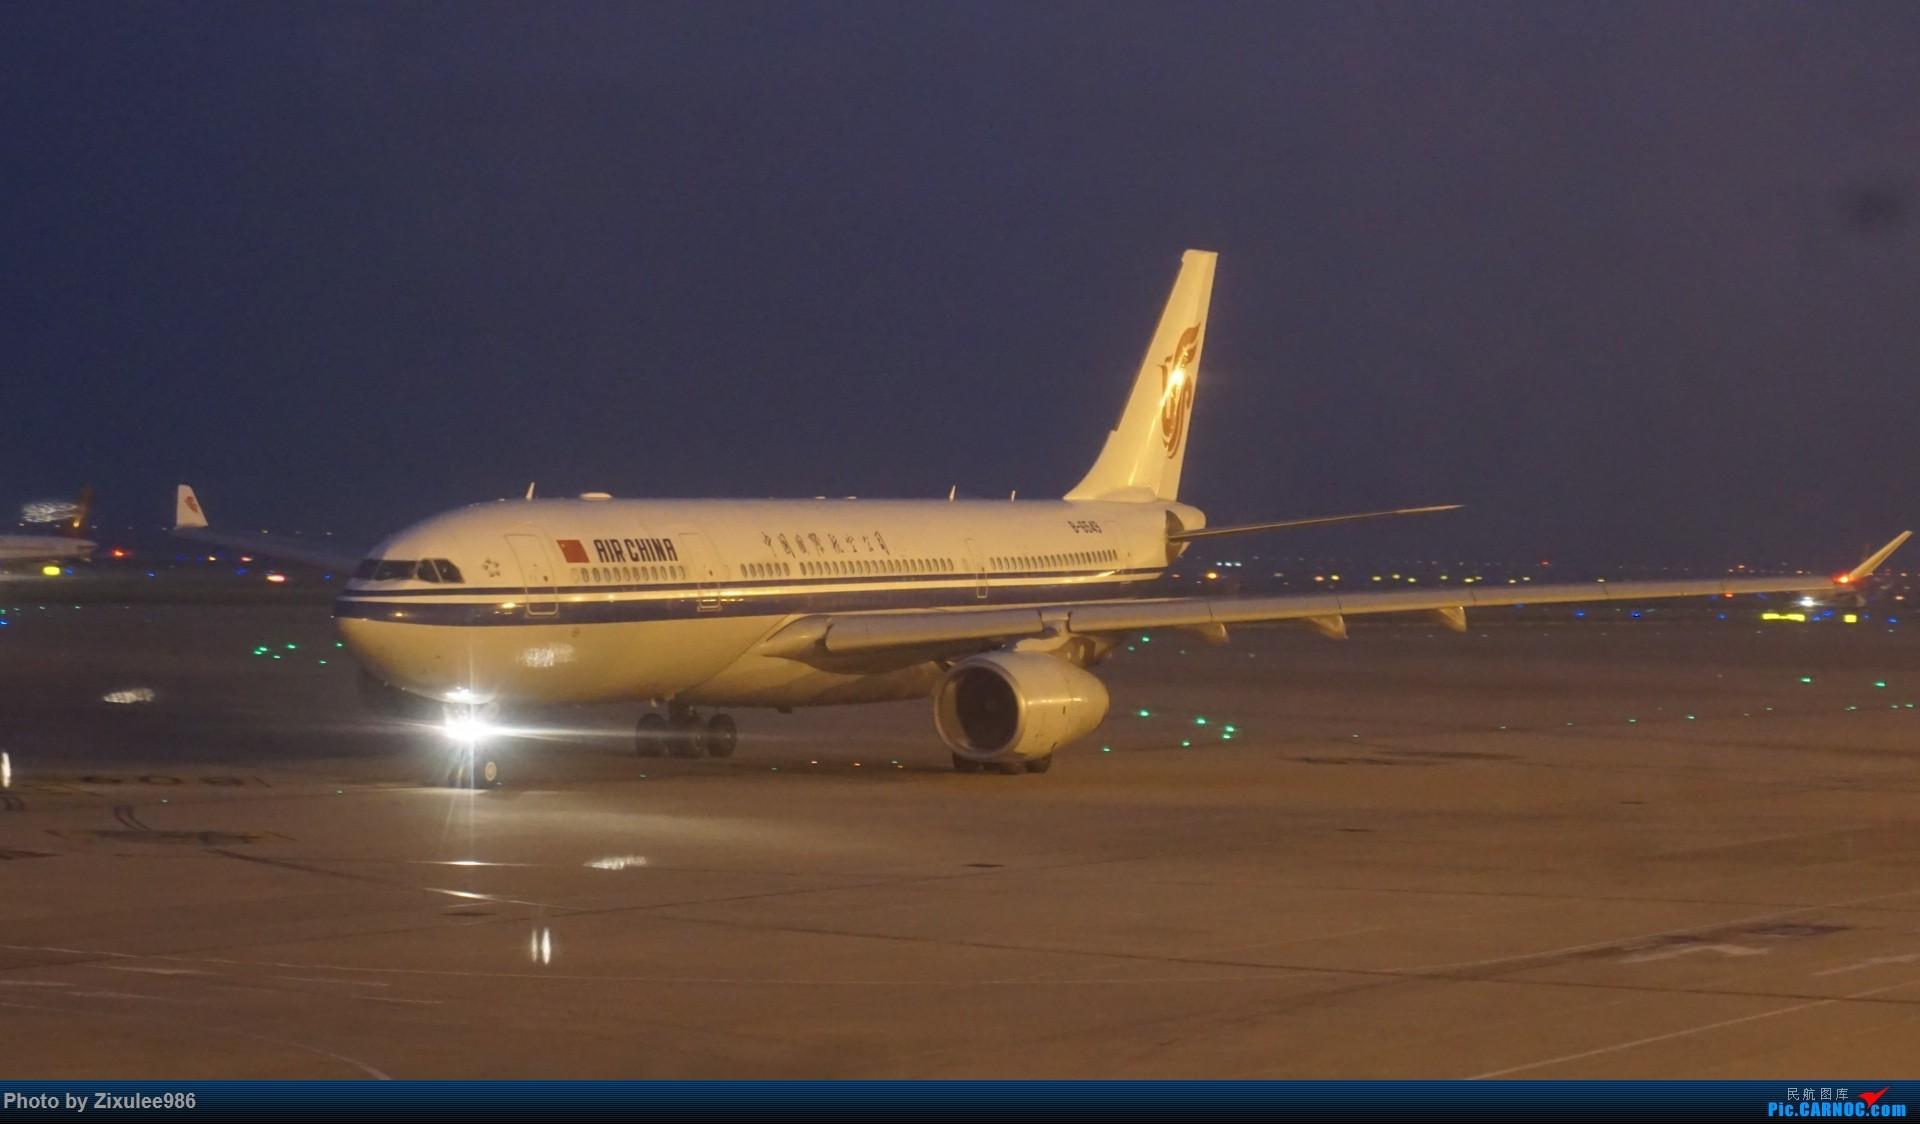 Re:[原创]加拿大21日游学之旅 (二)~加航AC28..PVG-YYZ到达多村后的雨天~多图缓更,请各位大侠谅解~ AIRBUS A330-200 B-6549 中国上海浦东国际机场